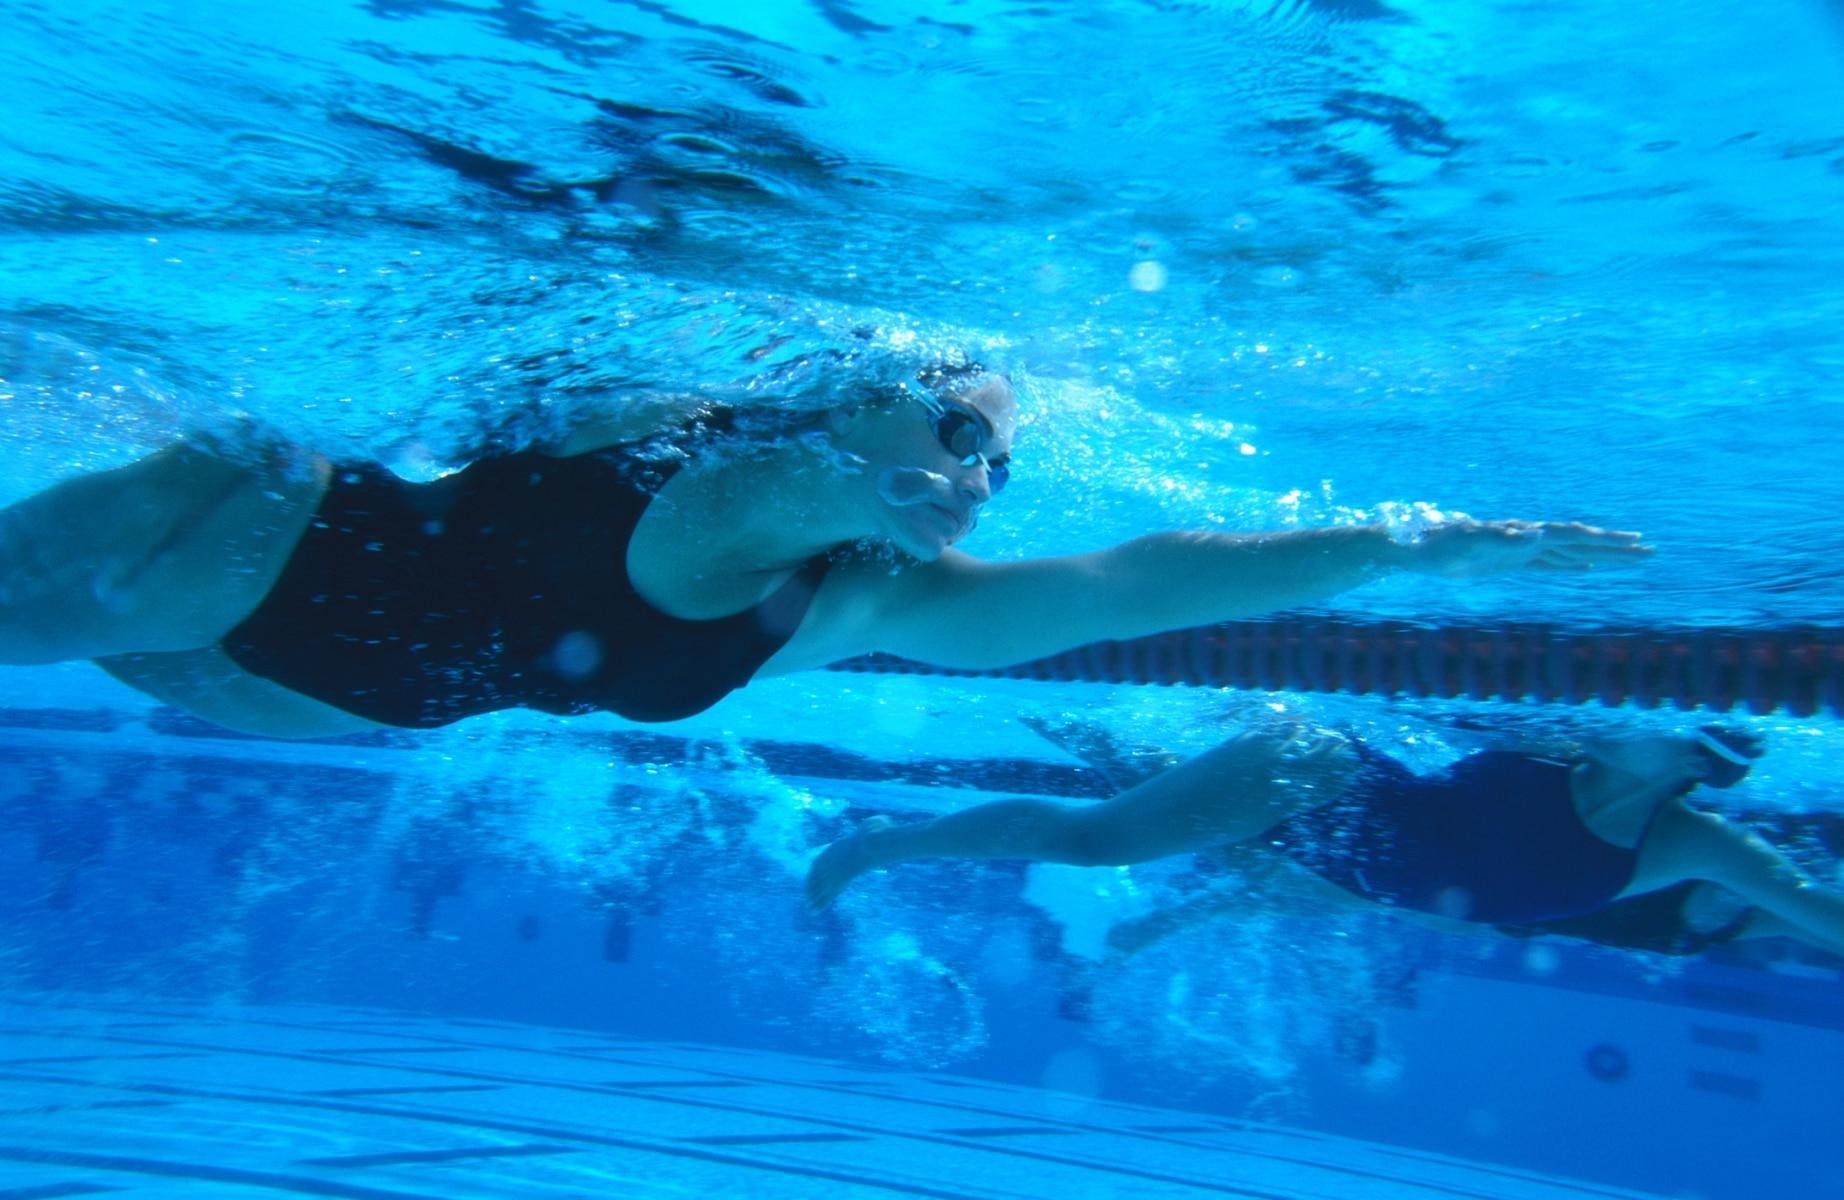 Entrenamiento de natación para adelgazar